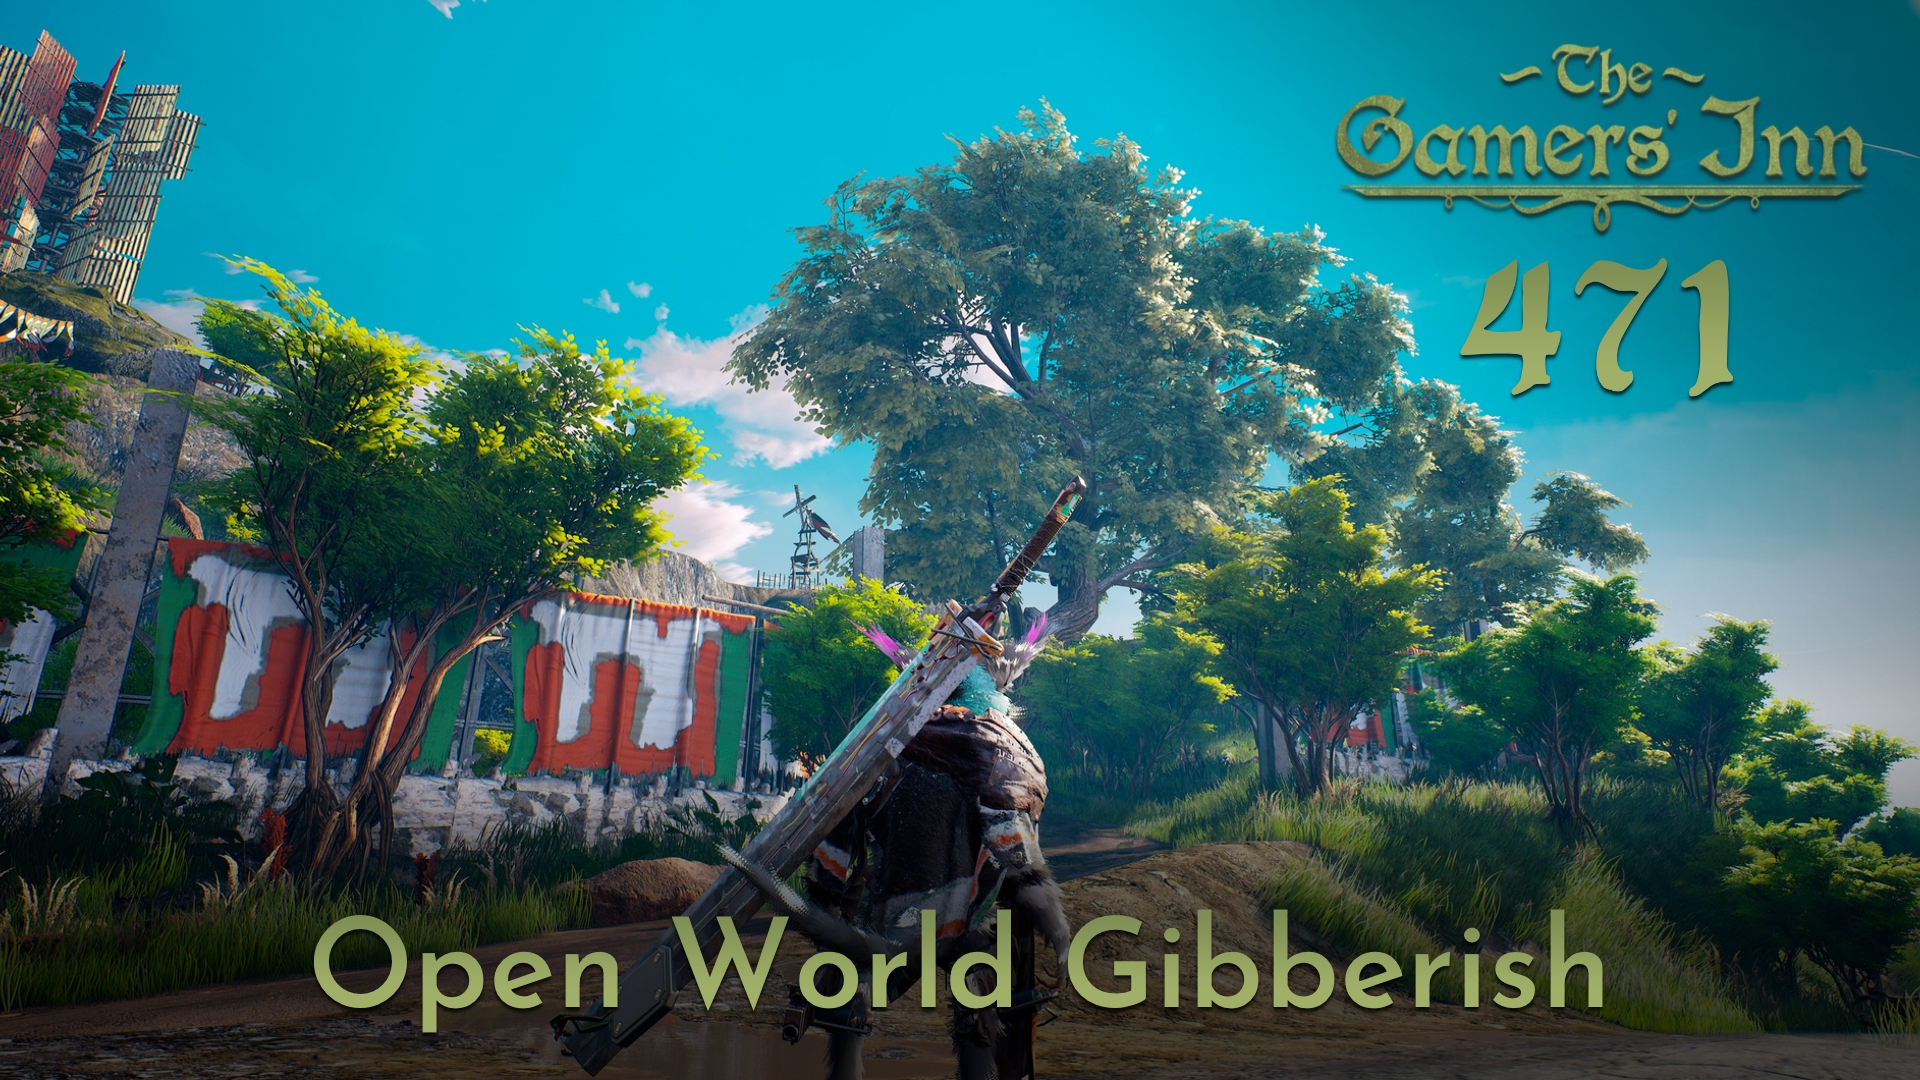 TGI 471 - Open World Gibberish